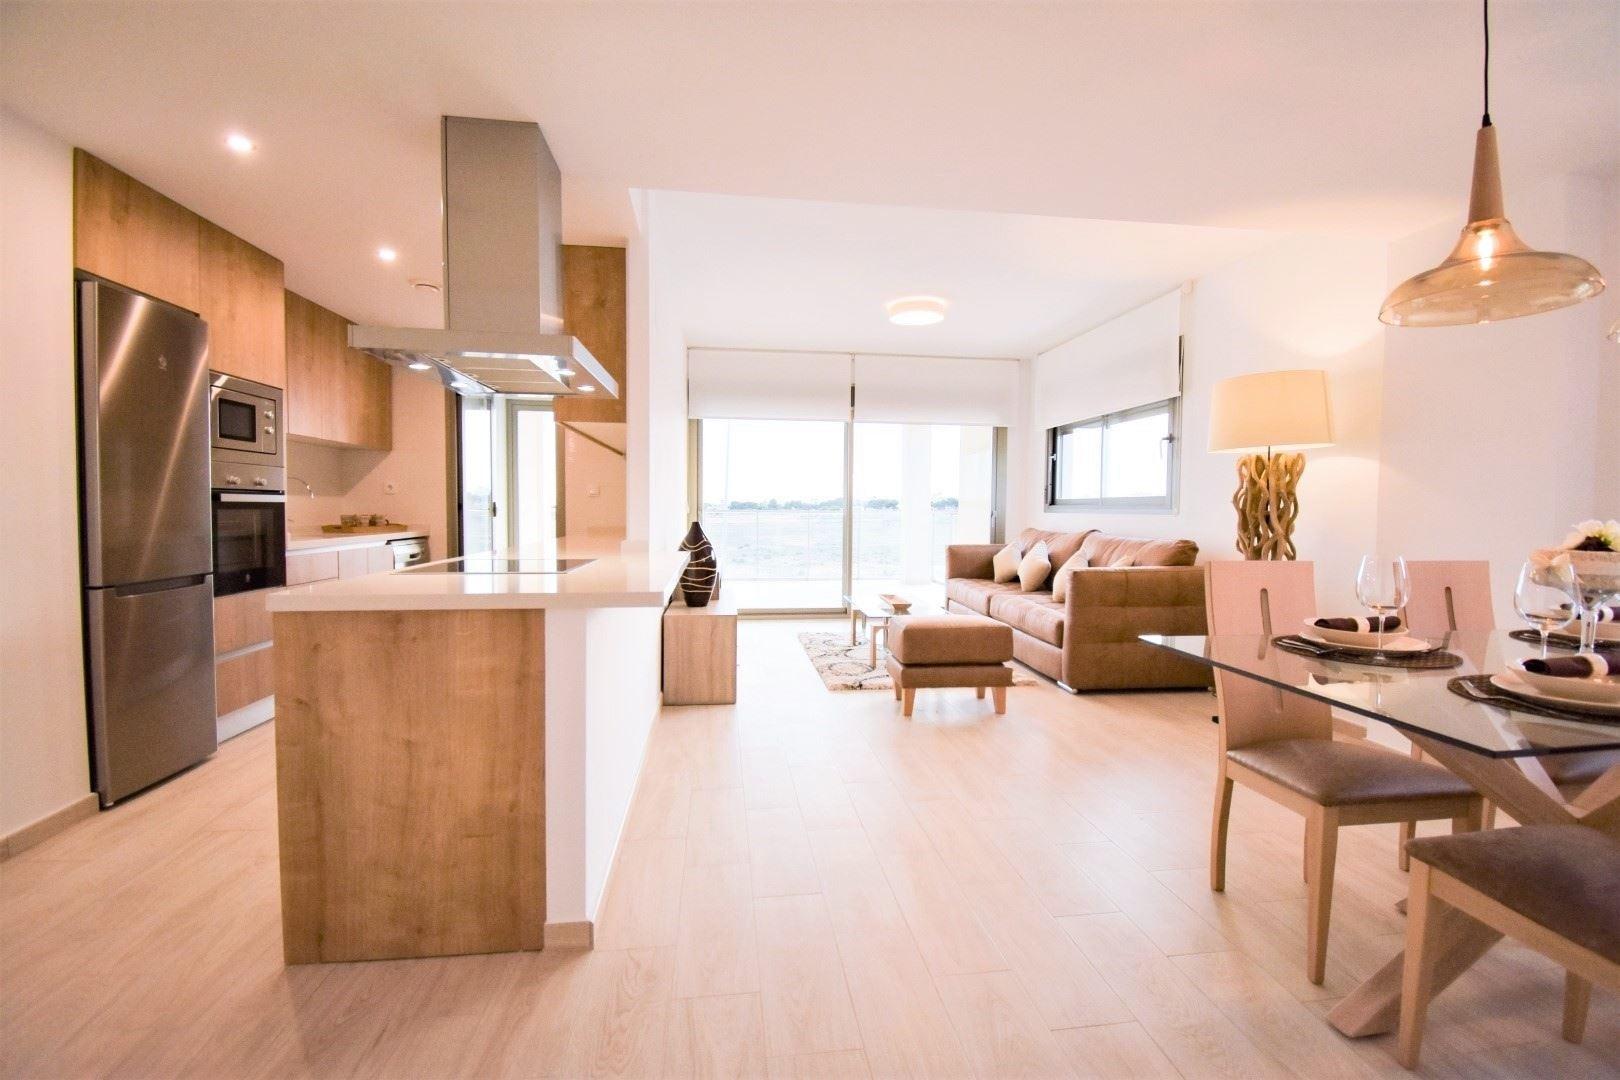 Foto 4 : Appartement te   (Spanje) - Prijs € 186.000